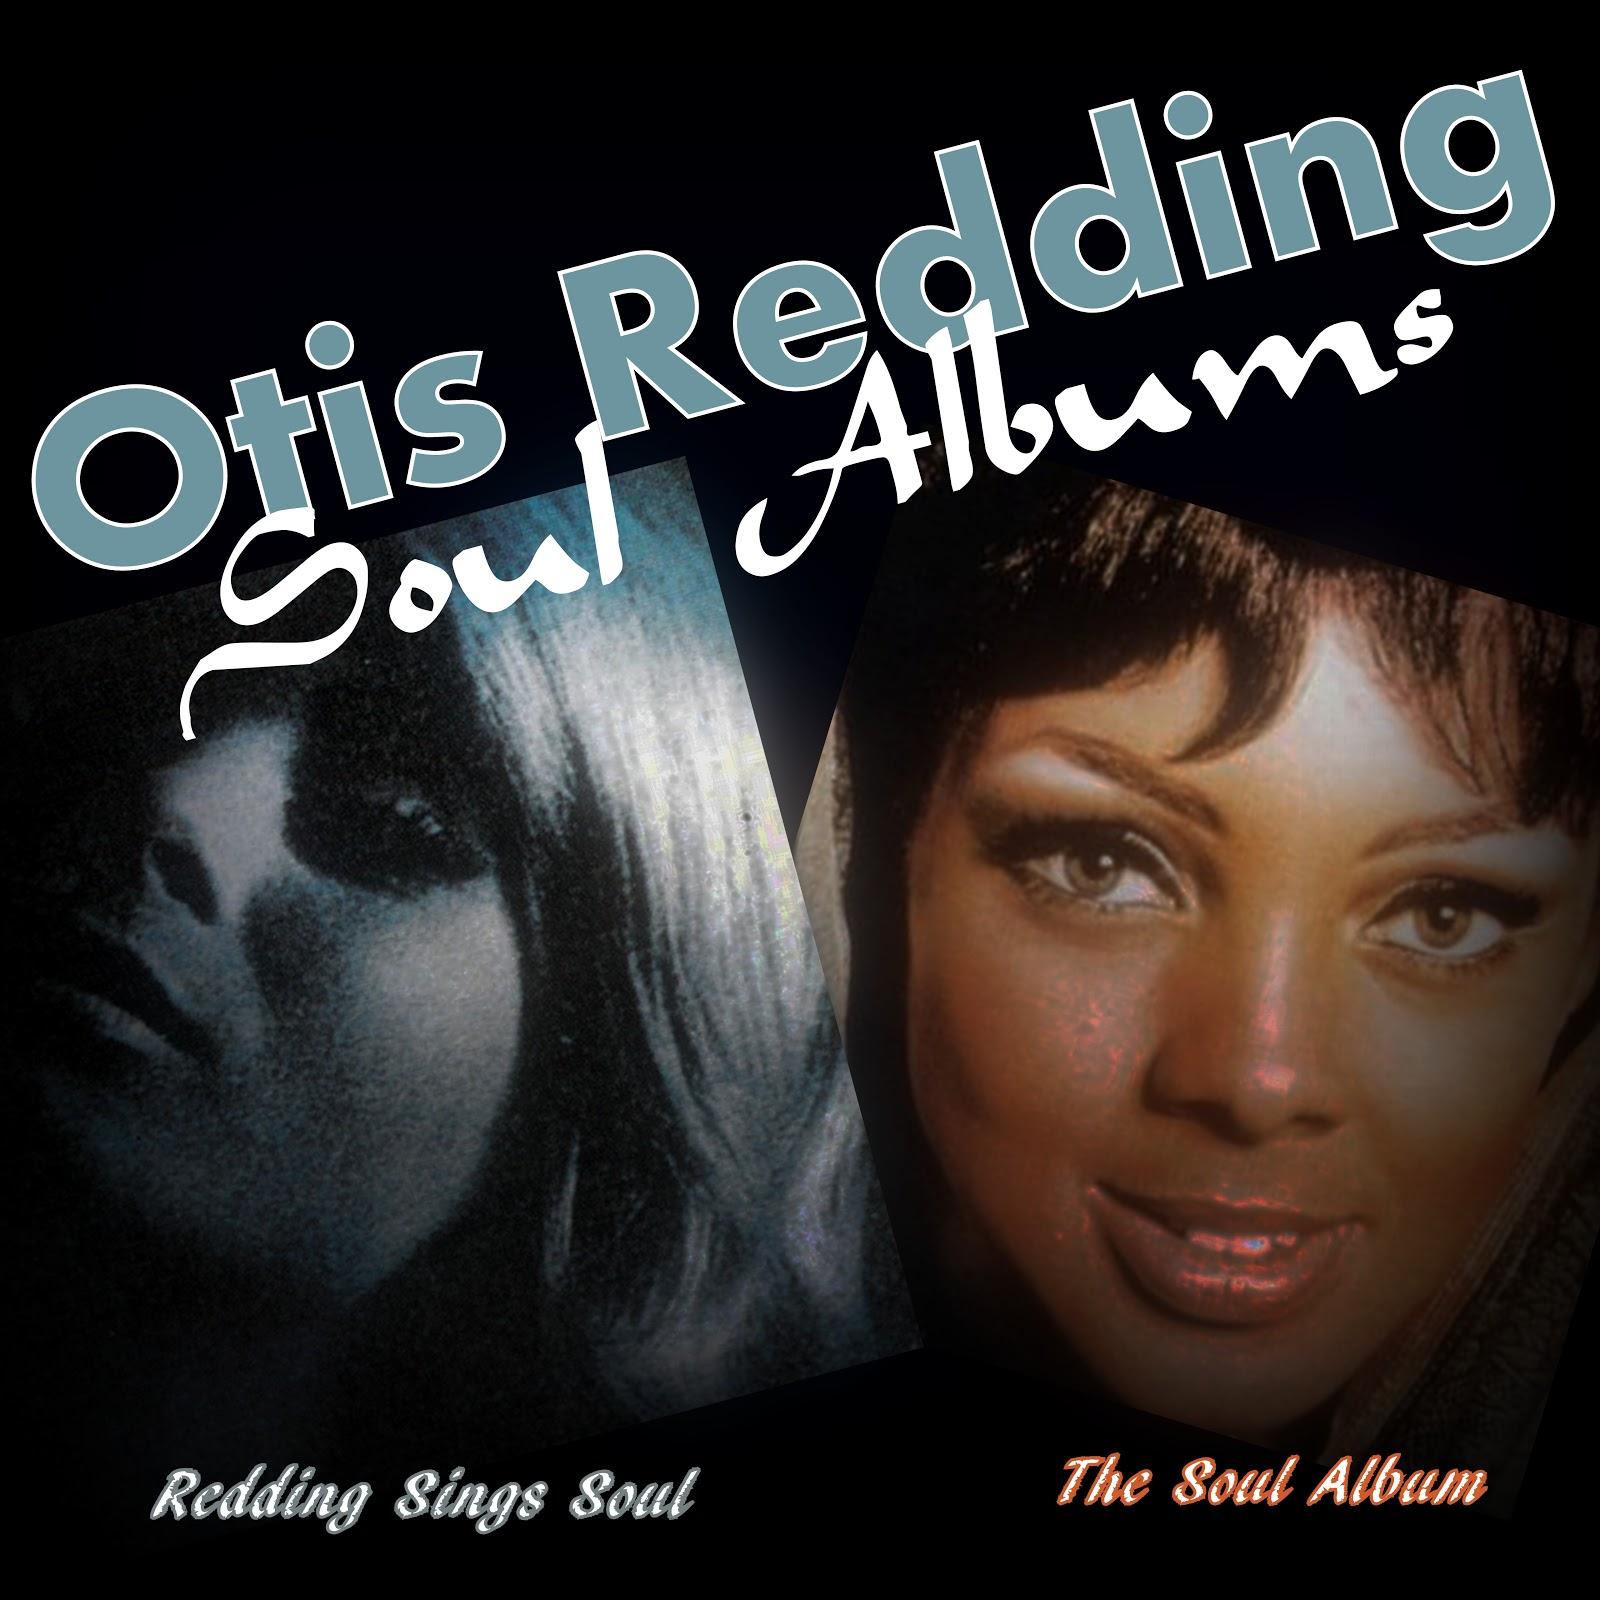 music archive otis redding the soul albums 2 in 1 1966